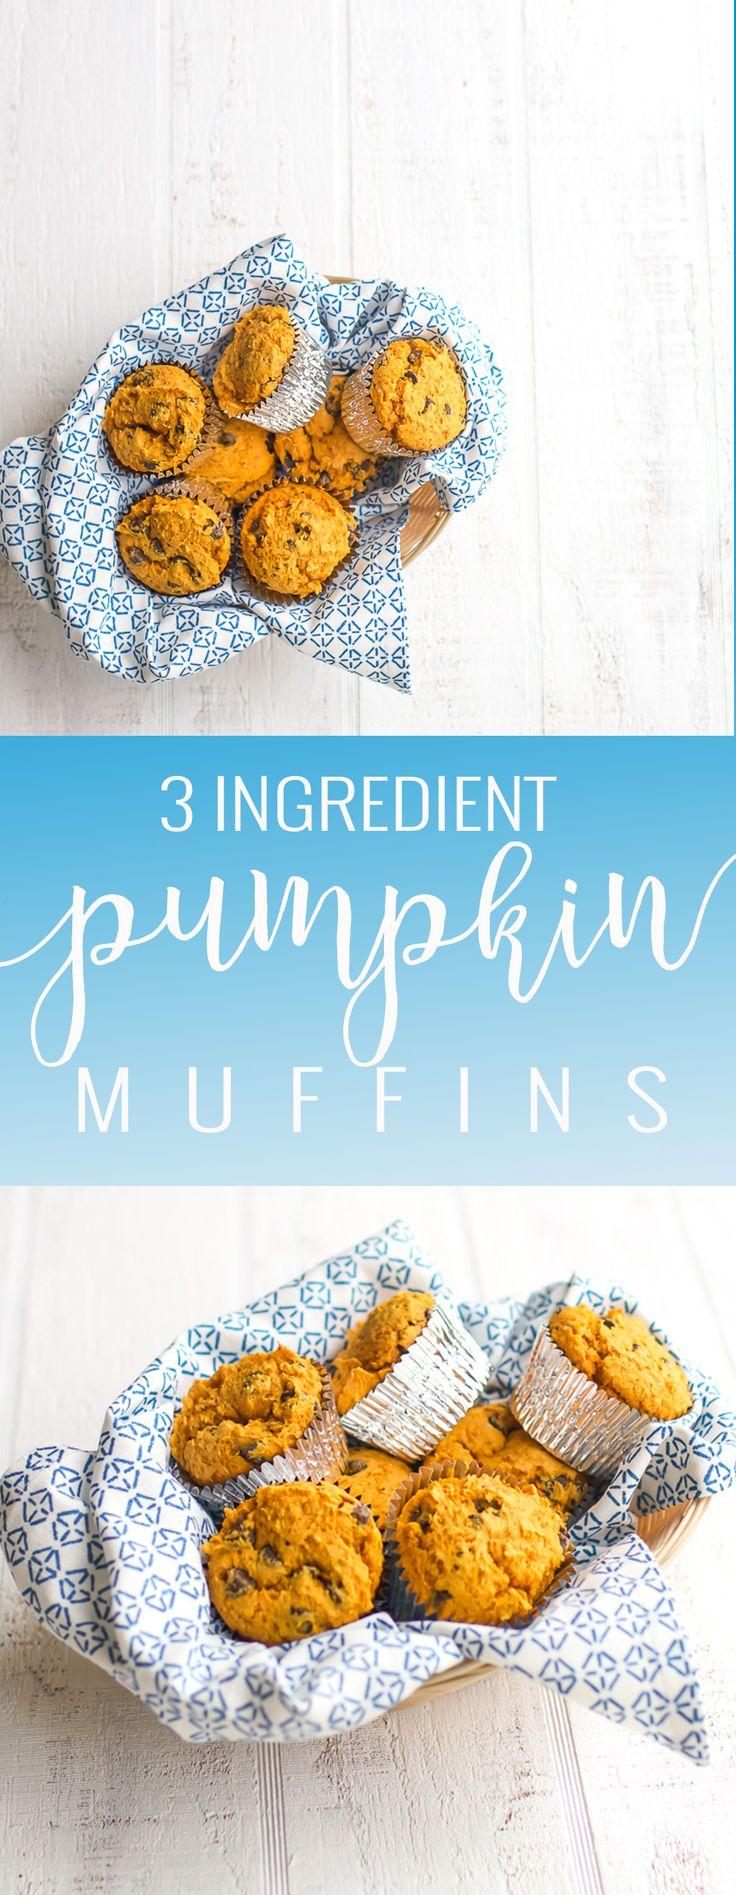 The Easiest Pumpkin Muffins   homemade pumpkin muffin recipe   pumpkin breakfast recipes   fall breakfast recipes   pumpkin recipe ideas   pumpkin dessert recipes   homemade muffin recipes   easy pumpkin recipes    Oh So Delicioso